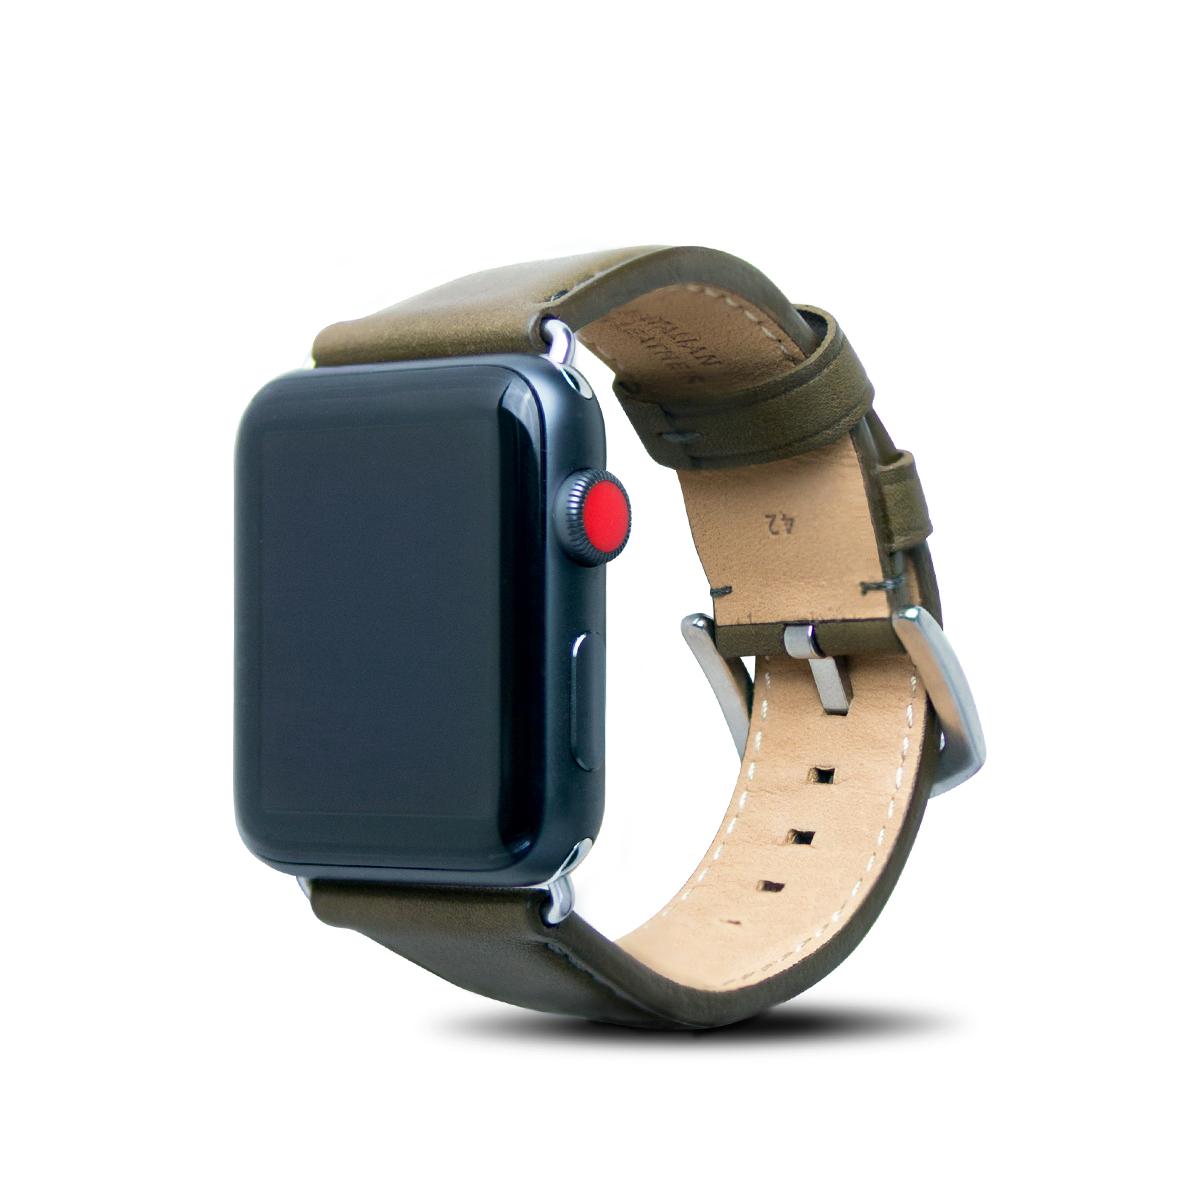 Apple Watch 42mm 皮革錶帶 - 橄欖綠